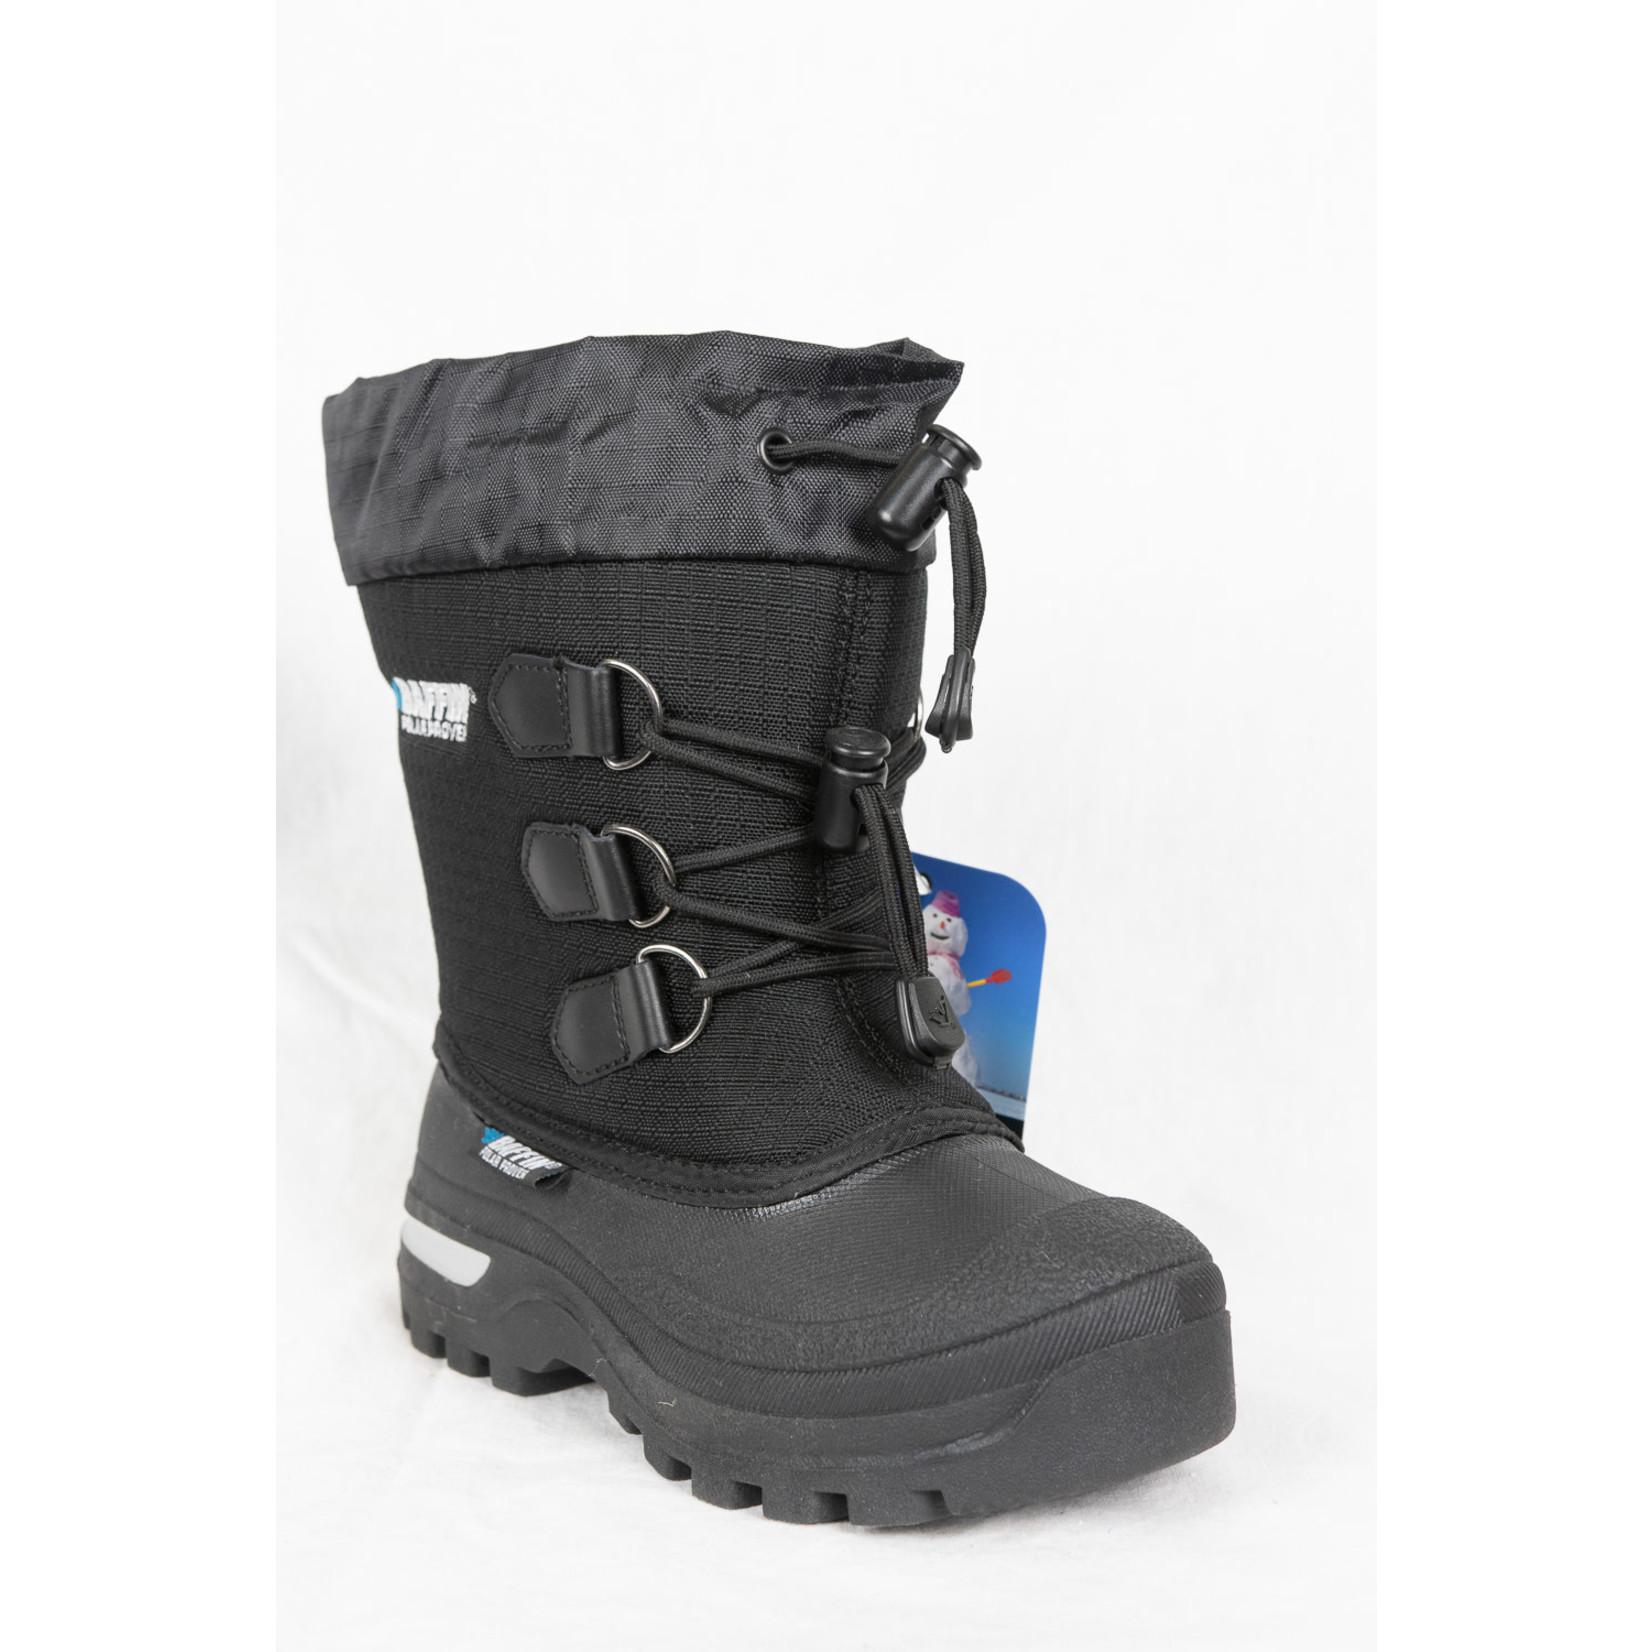 Baffin Baffin Kids Winter Boot -40C Black Igloo 4880-0018